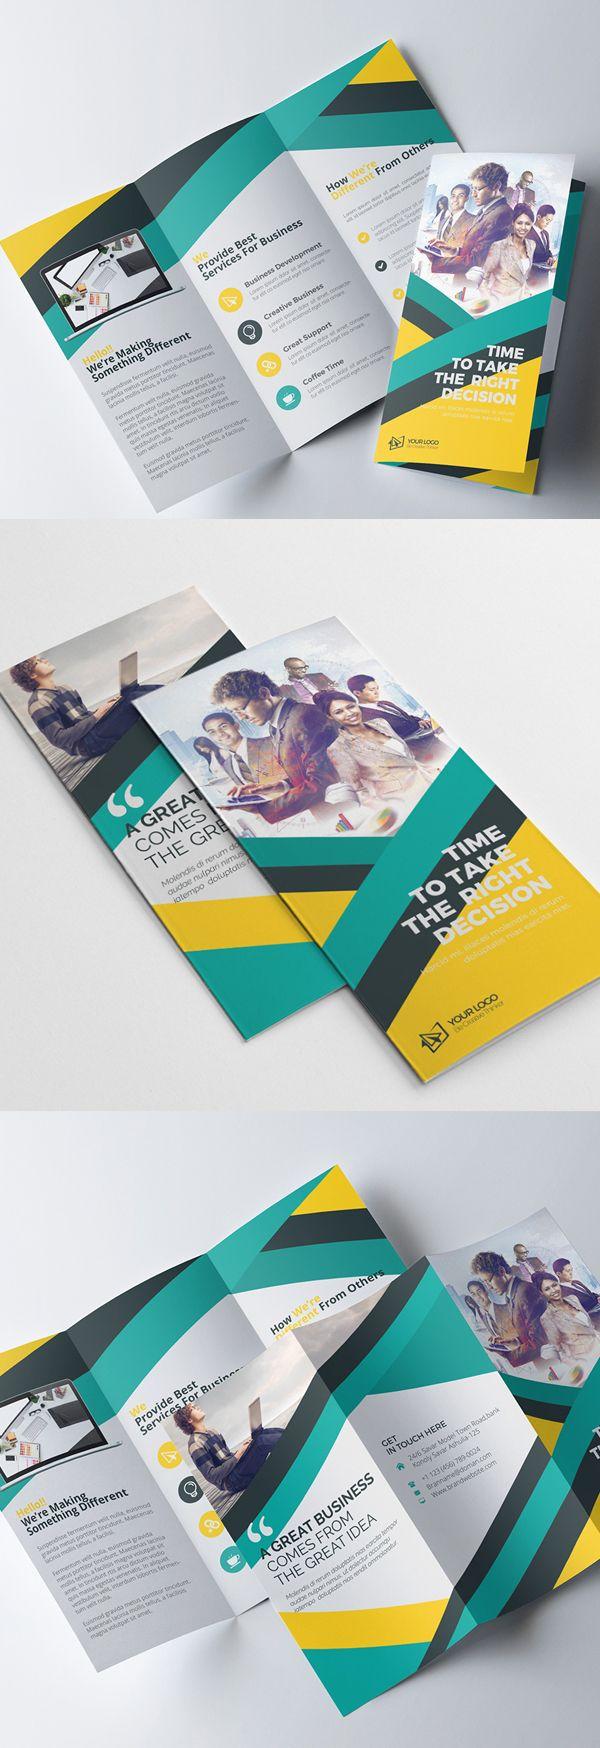 Corporate Tri fold Colorful Brochure Design